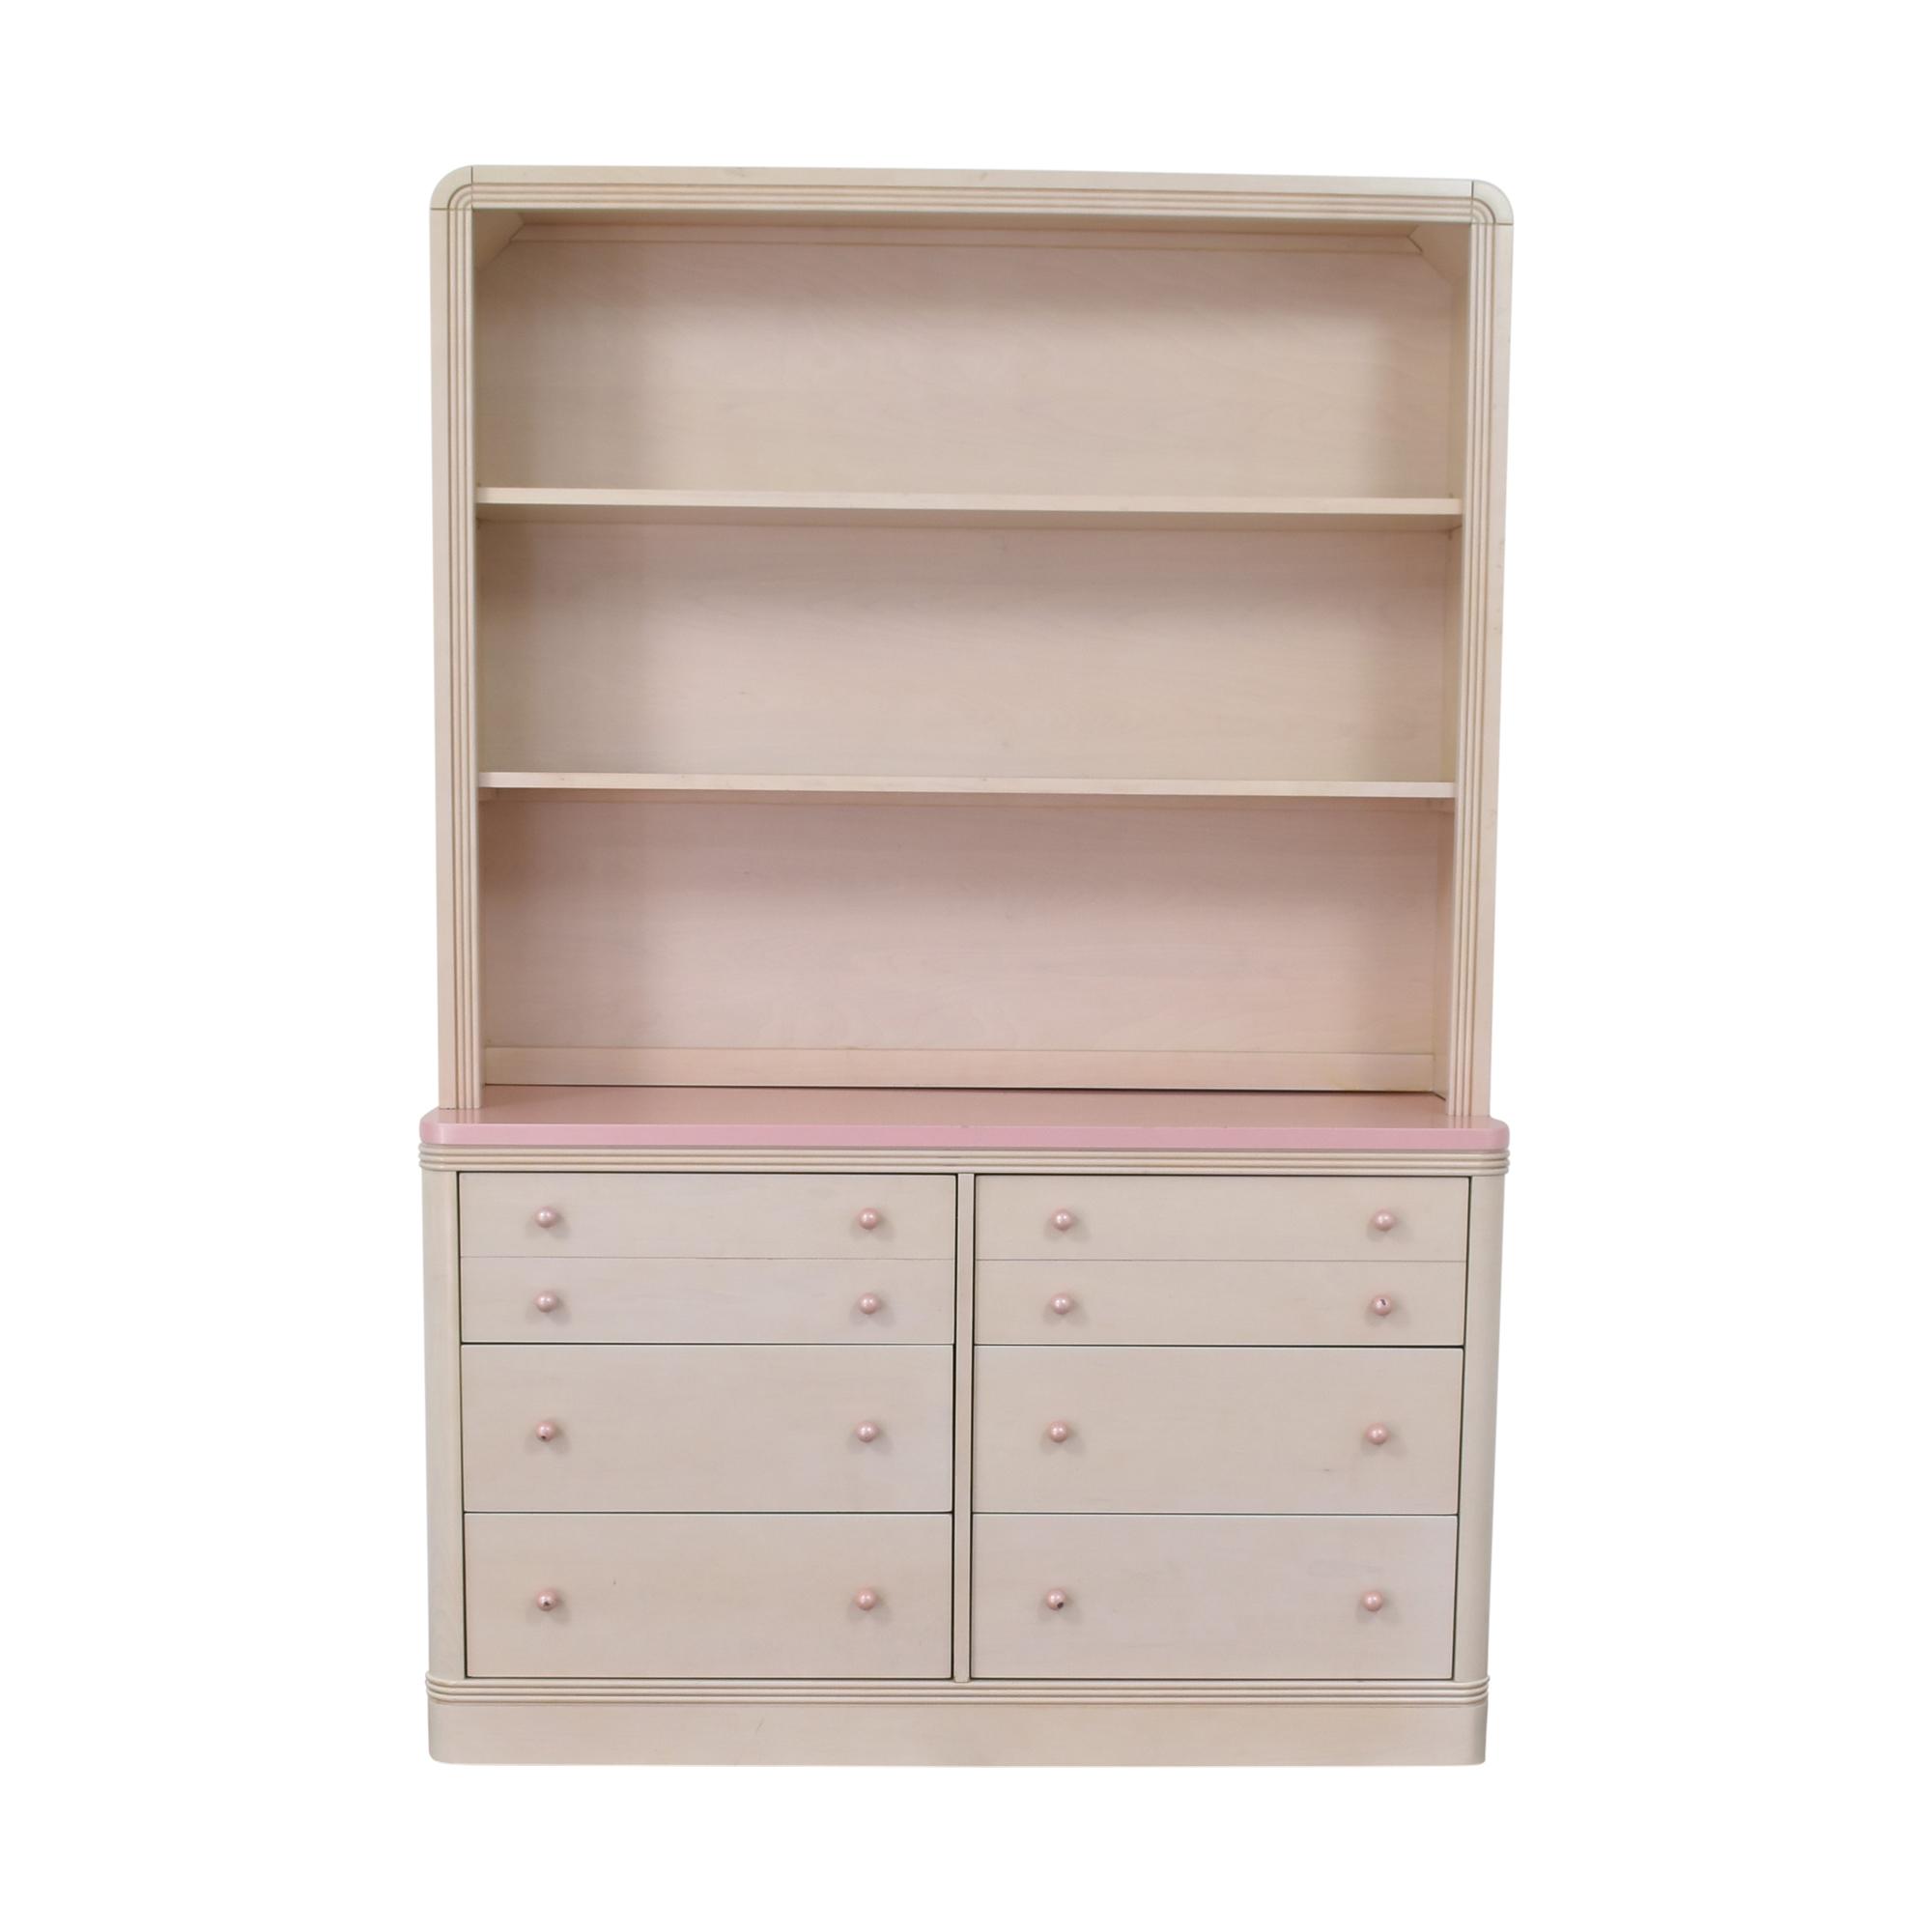 Ragazzi Ragazzi Six Drawer Dresser with Hutch nyc